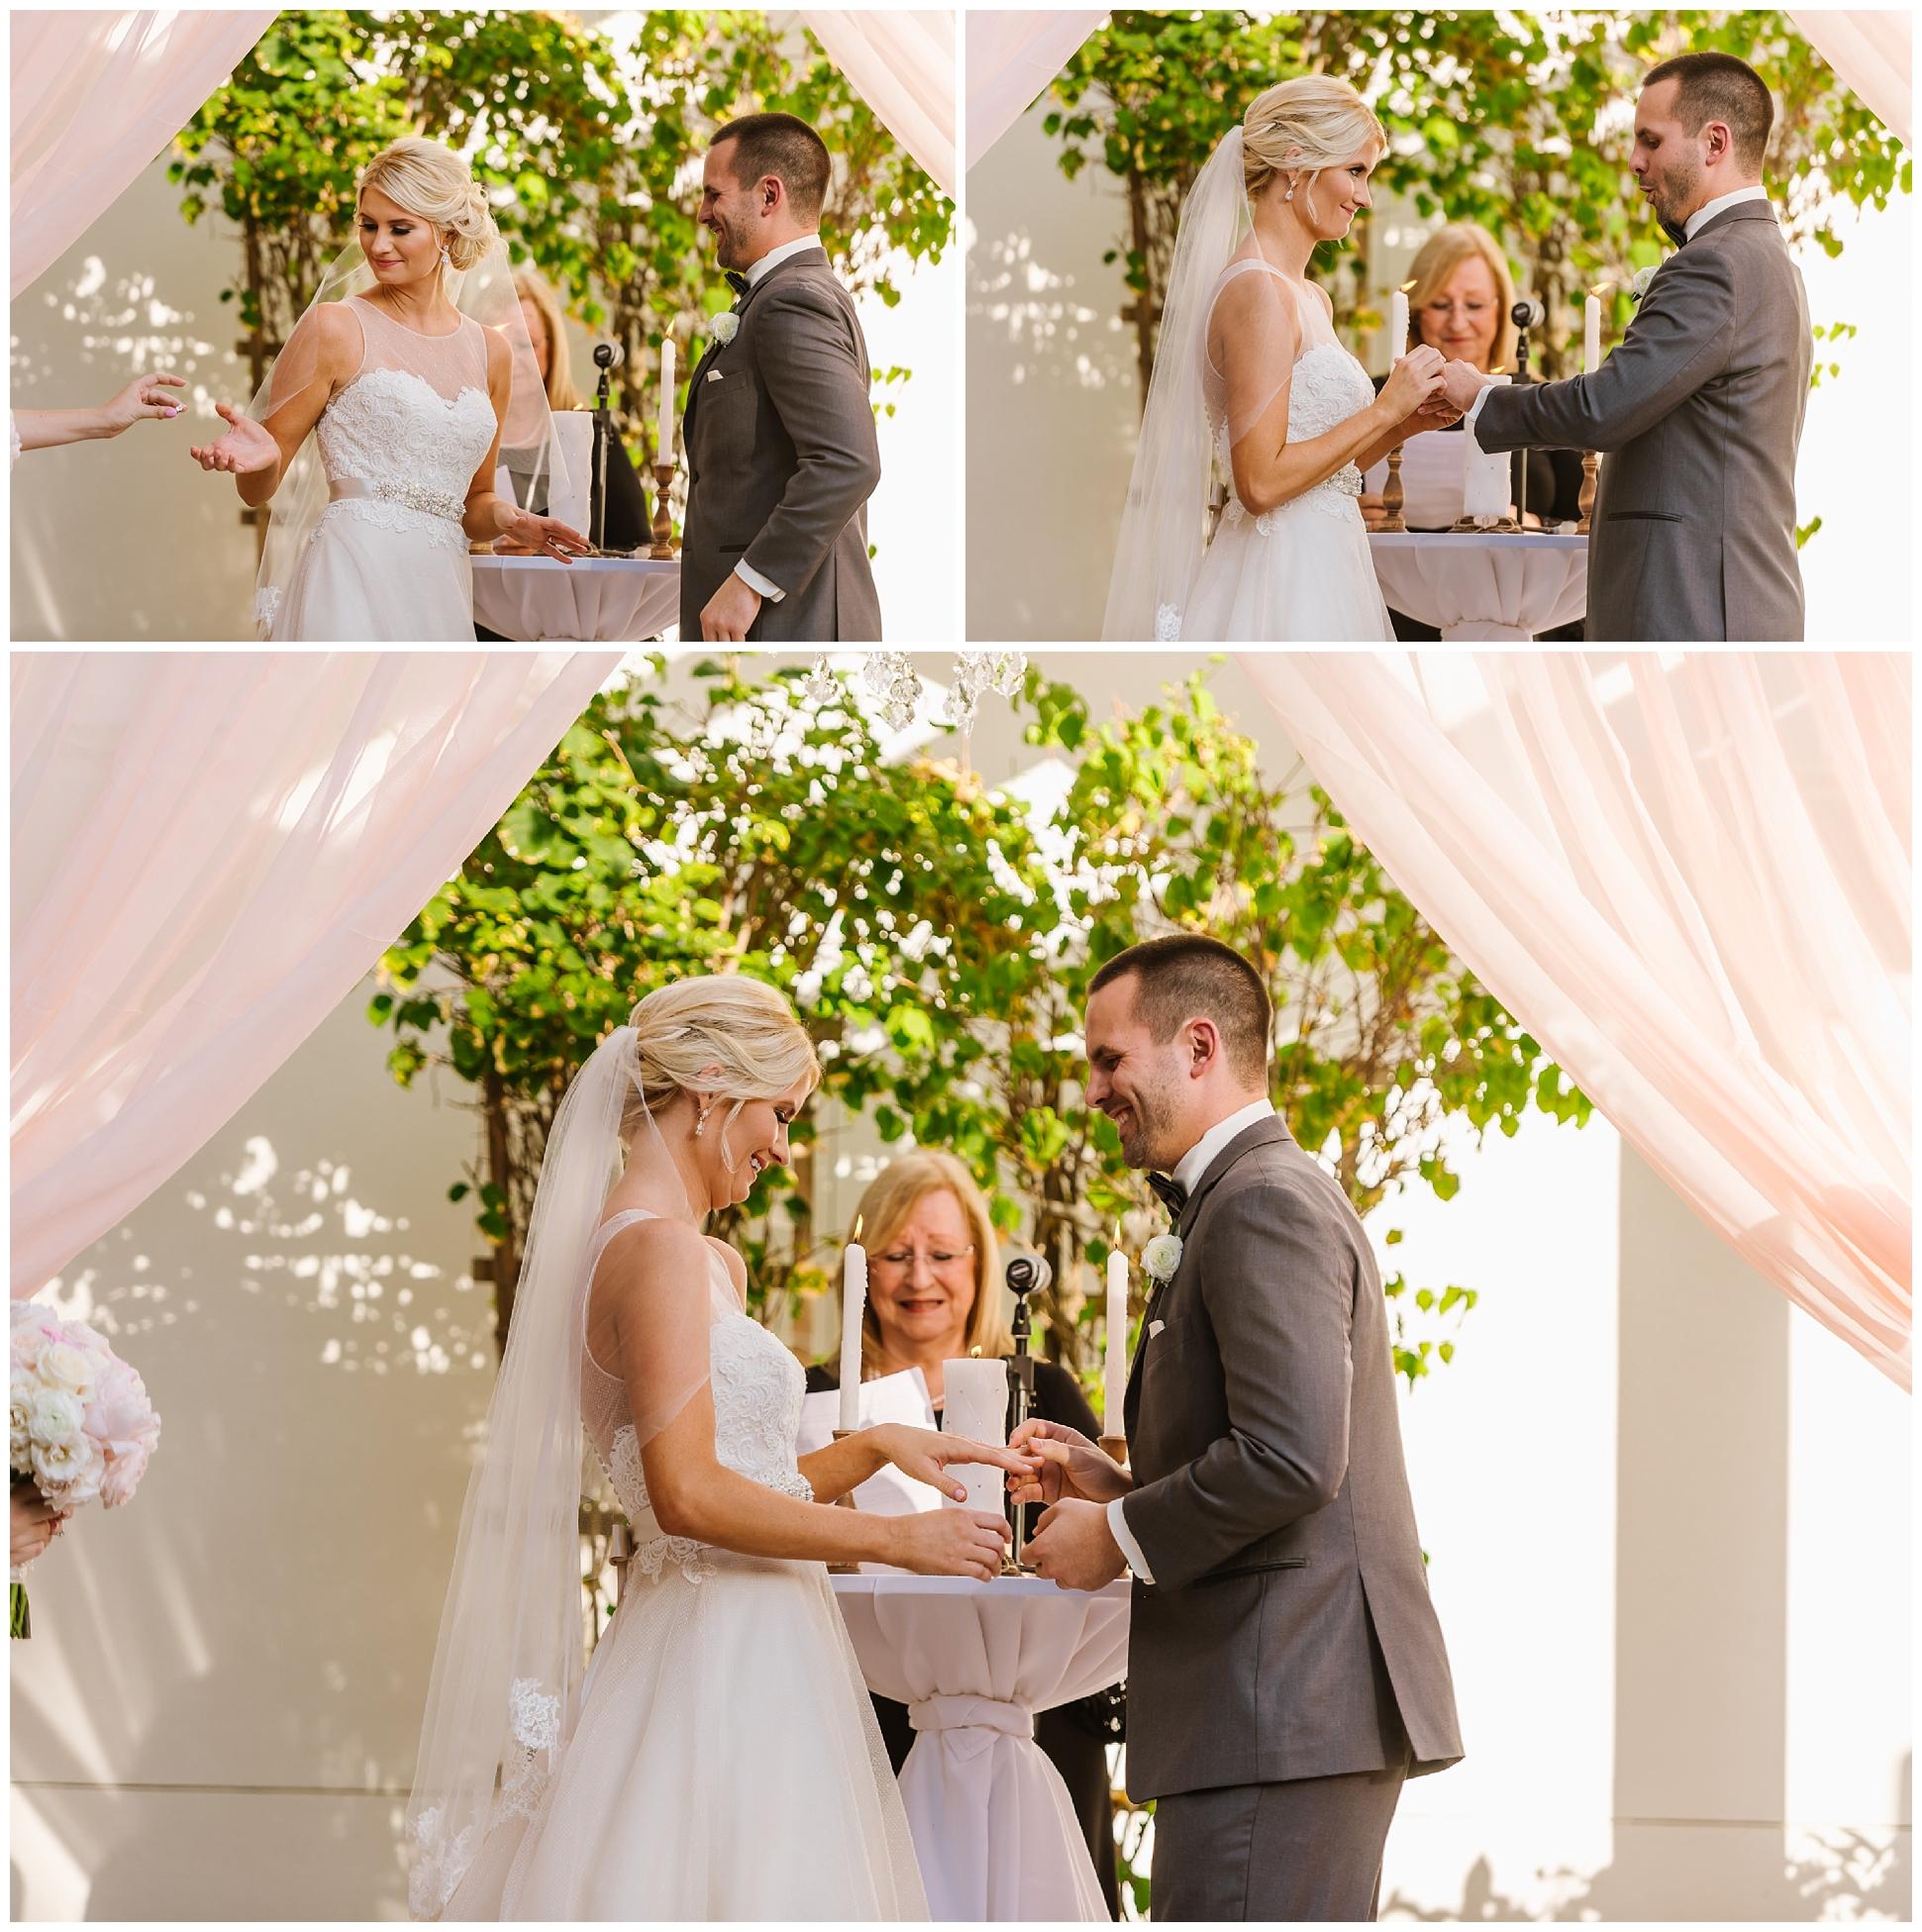 Sarasota-wedding-photographer-hyatt-regency-blush_0041.jpg